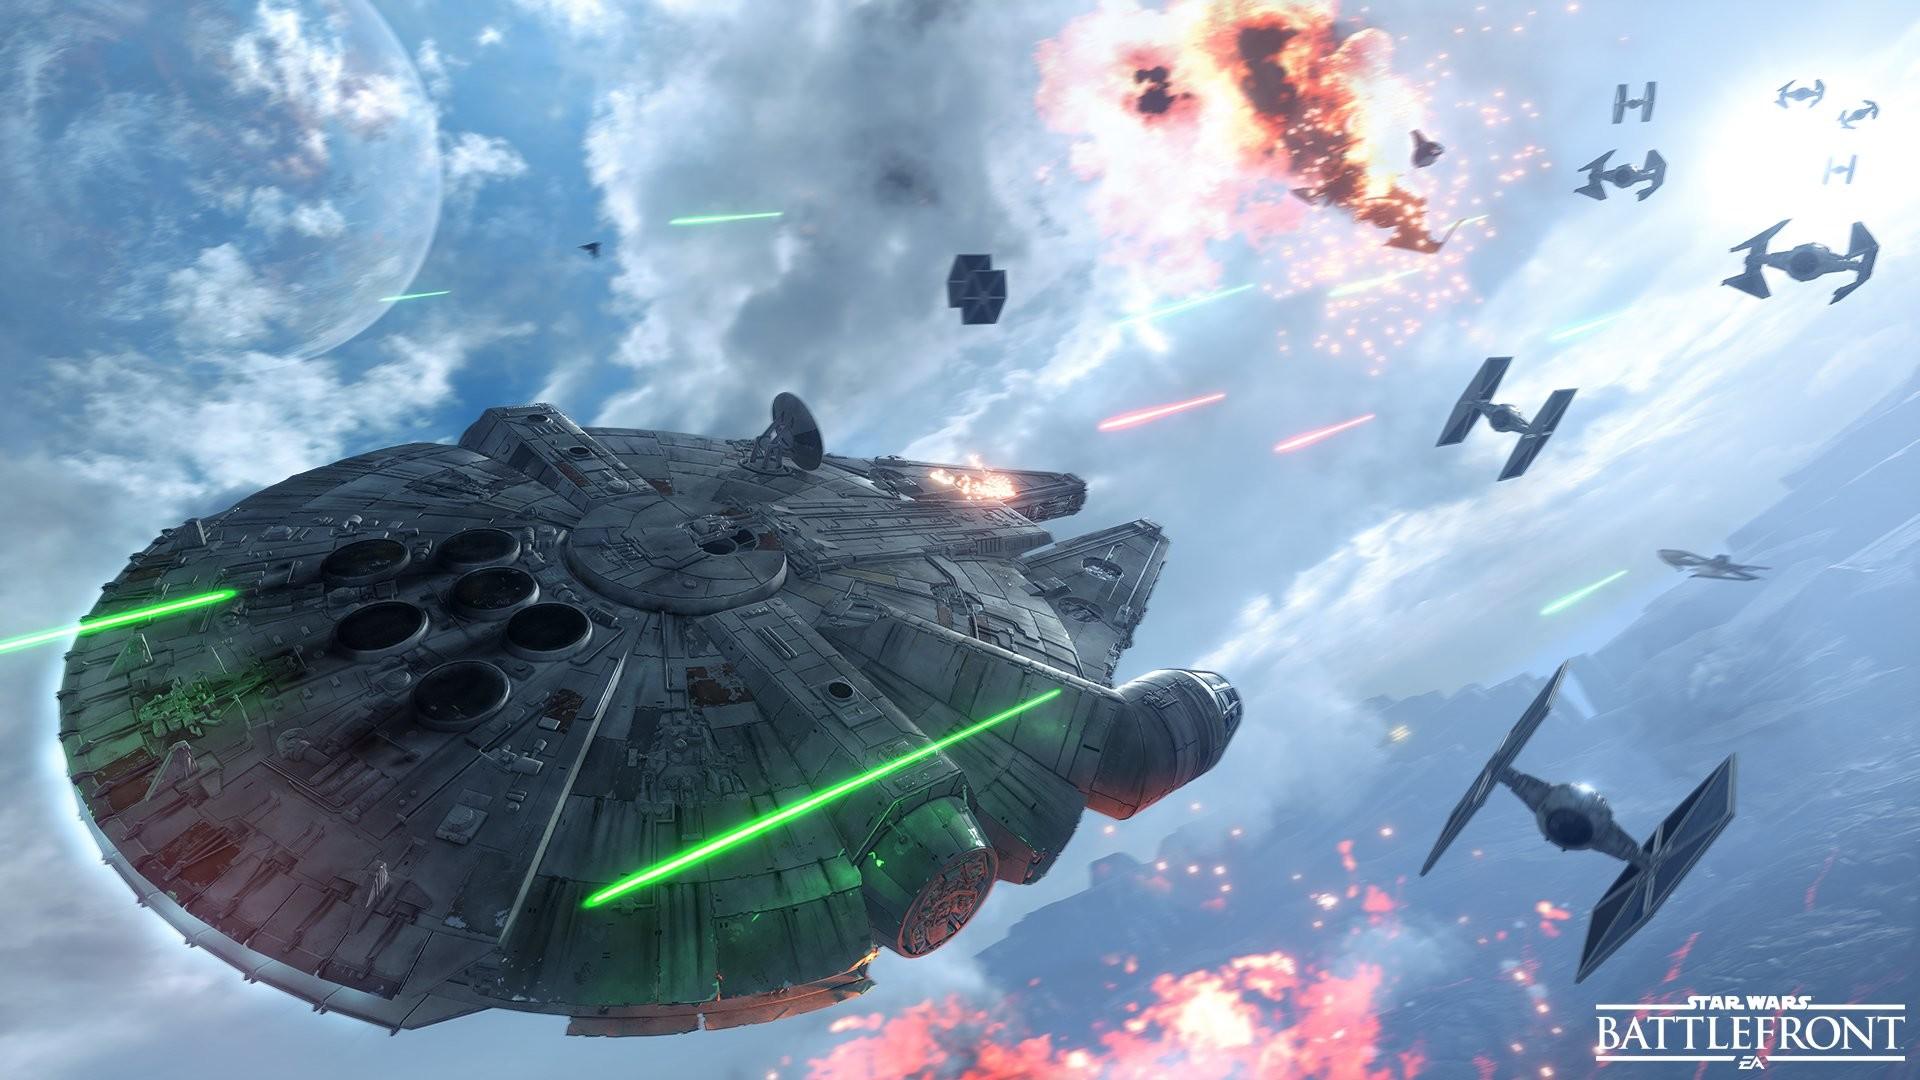 Video Game – Star Wars Battlefront (2015) Millennium Falcon Star Wars:  Battlefront Wallpaper